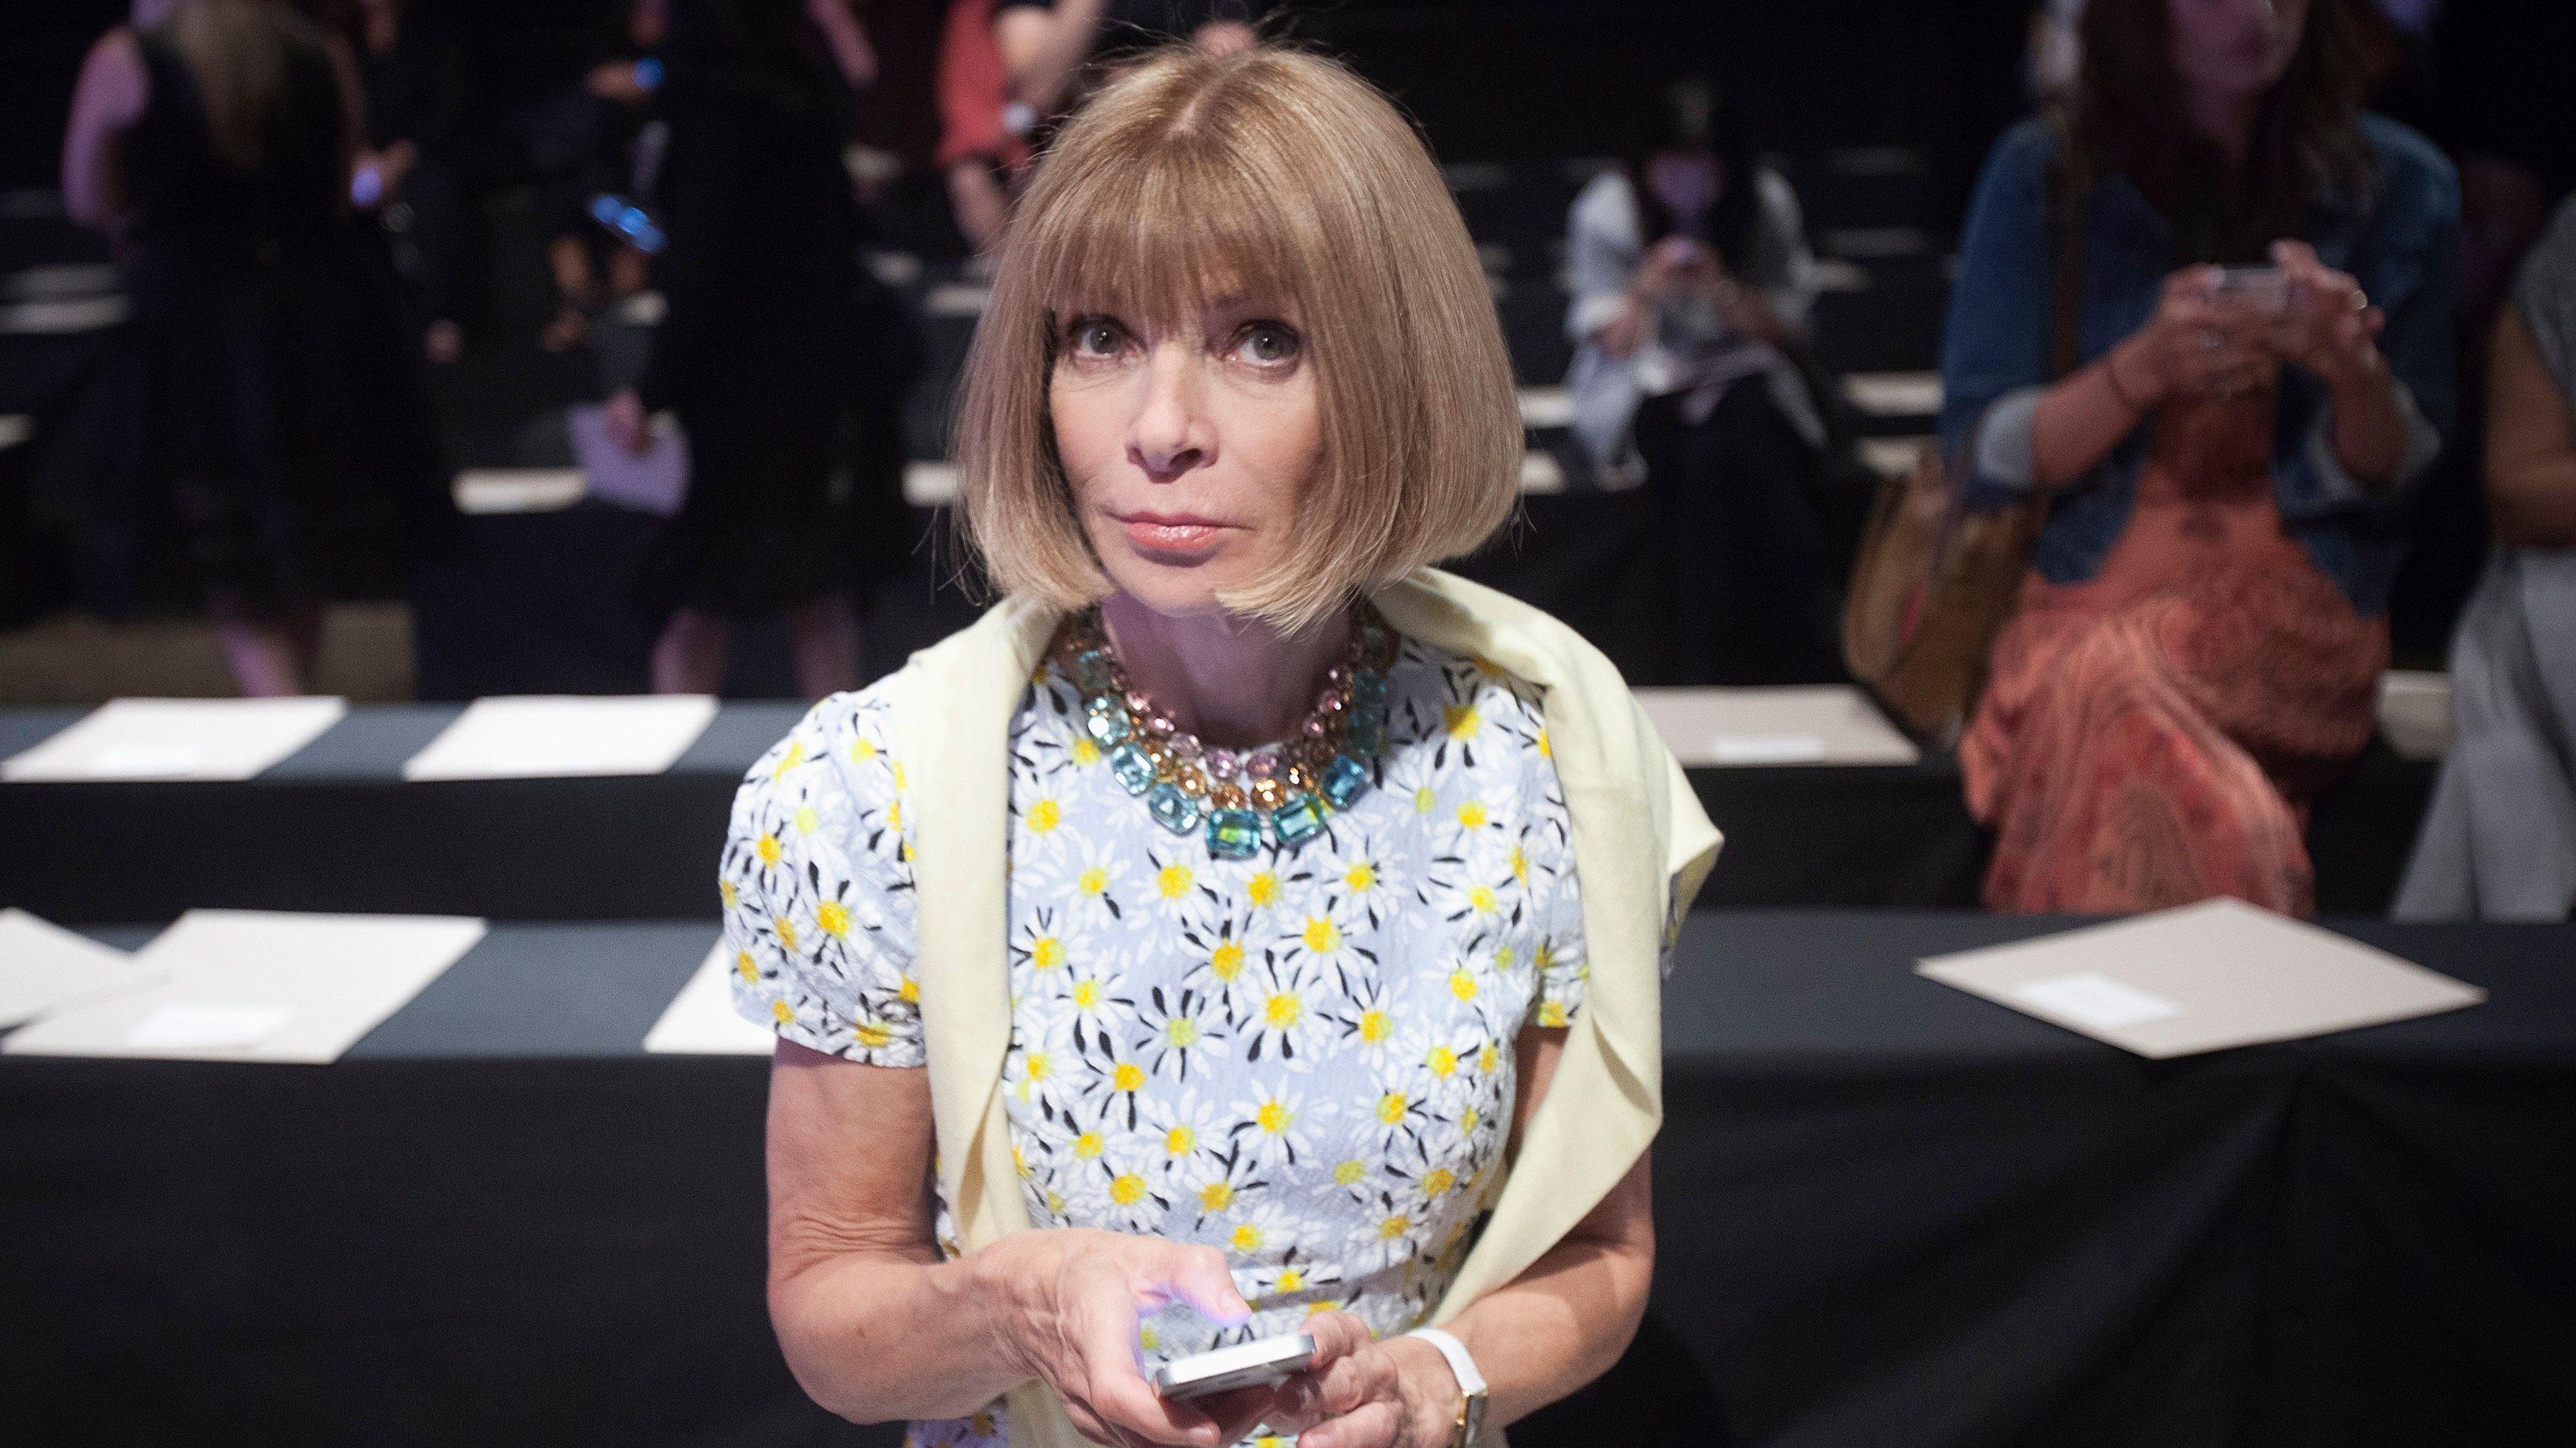 83c3df22d109b Vogue's Anna Wintour on how to dress for a job interview — Quartz at ...